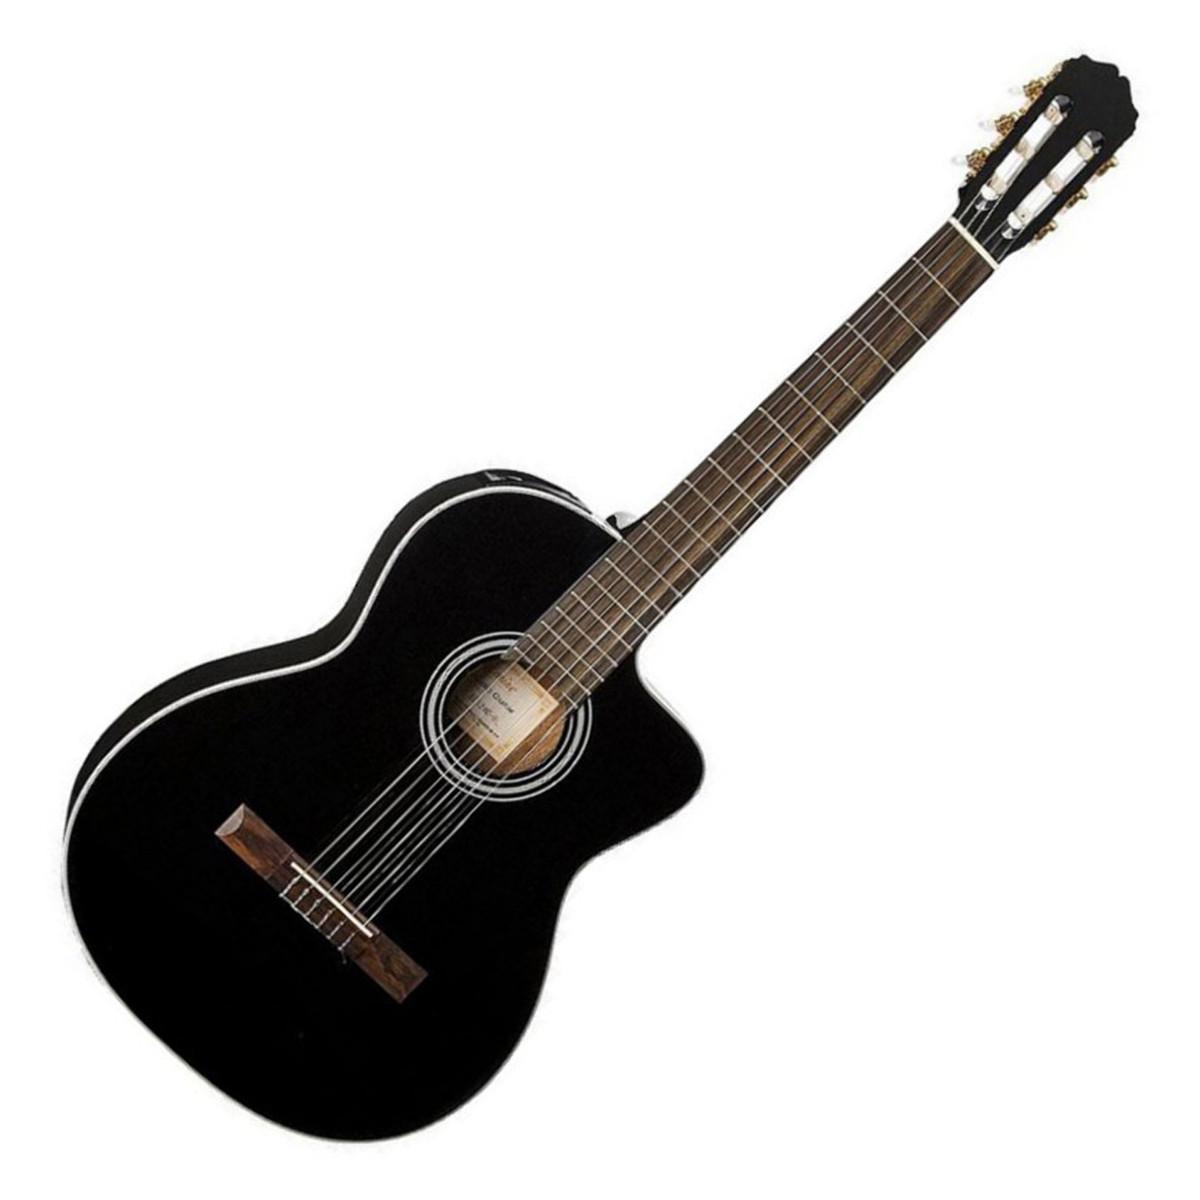 disc takamine gc3ce blk electro guitare classique noir. Black Bedroom Furniture Sets. Home Design Ideas